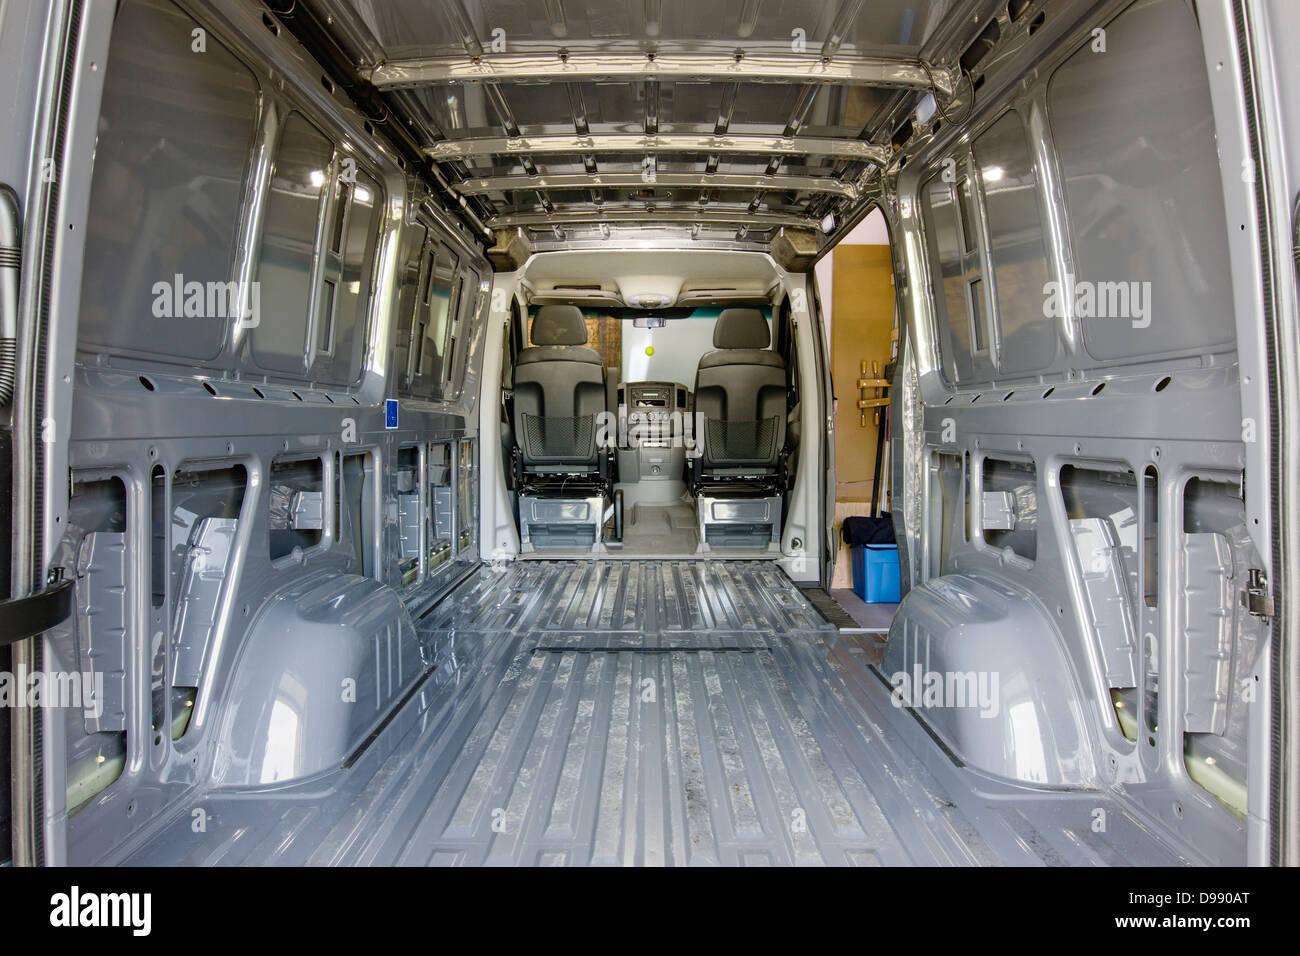 Interior View Of Mercedes Benz Sprinter Cargo Van 2500 Being Stock